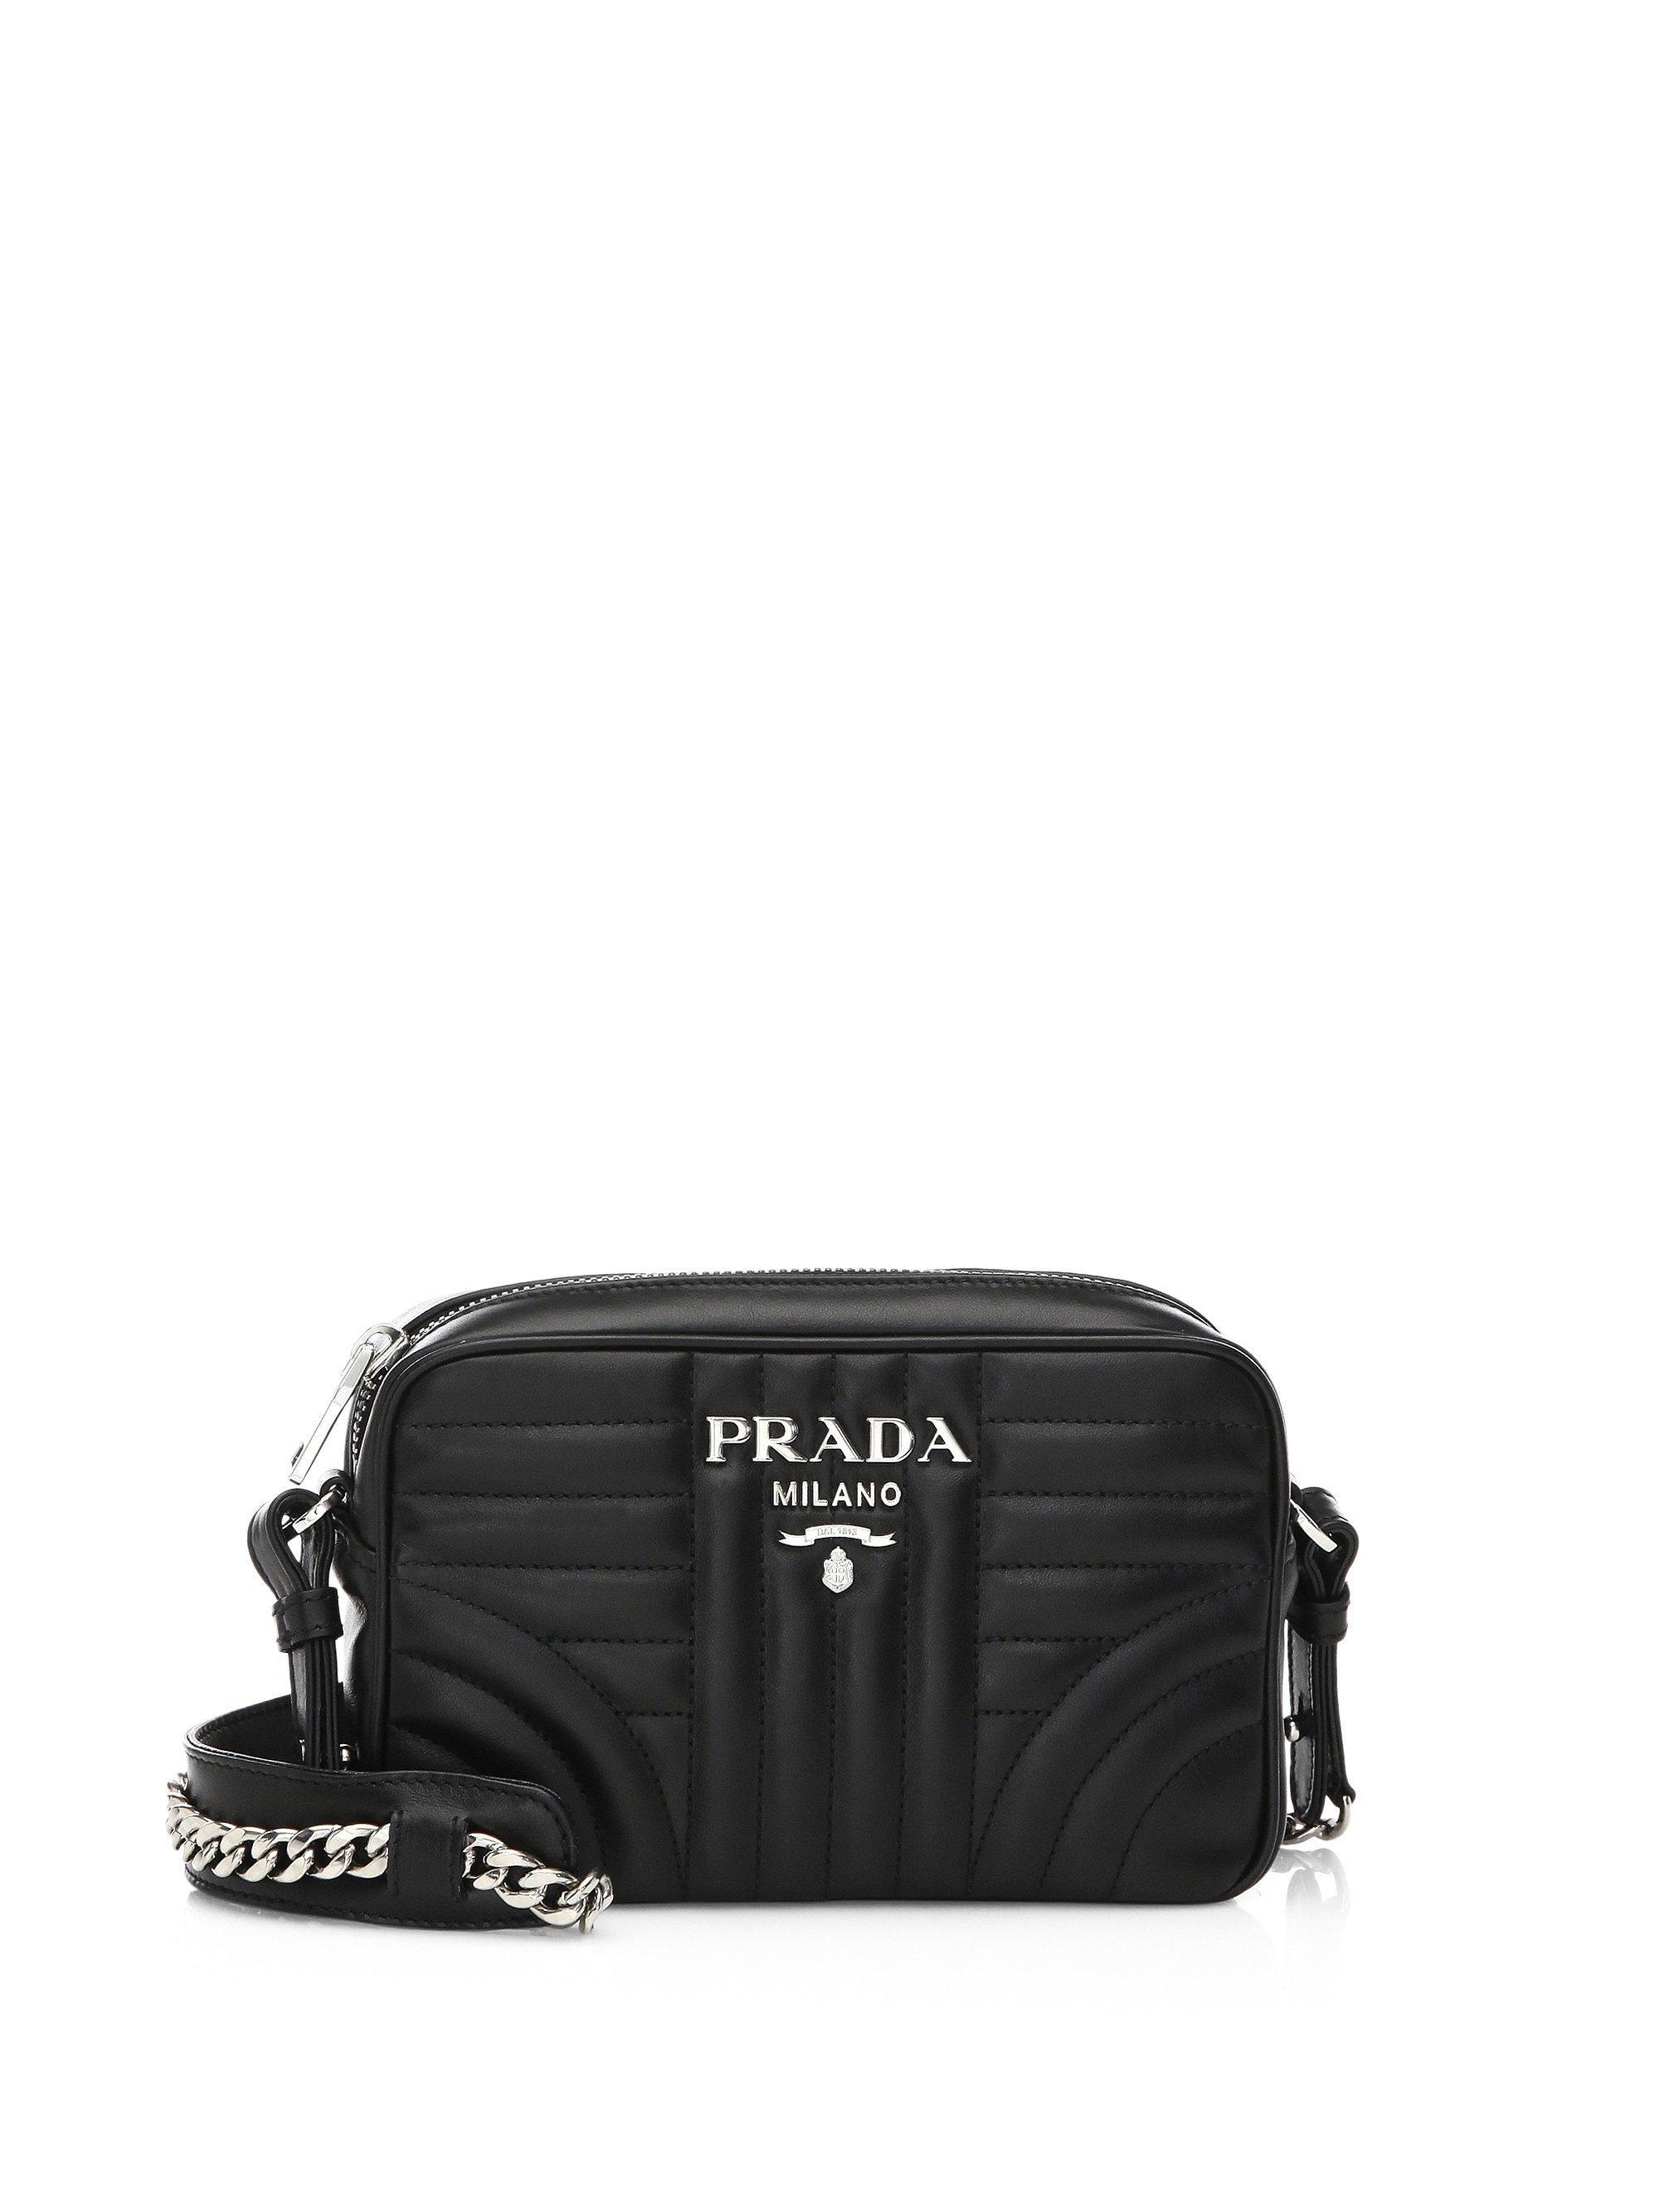 Cross Body Bags - Diagramme Crossbody Bag Nero - black - Cross Body Bags for ladies Prada ajwlC2z